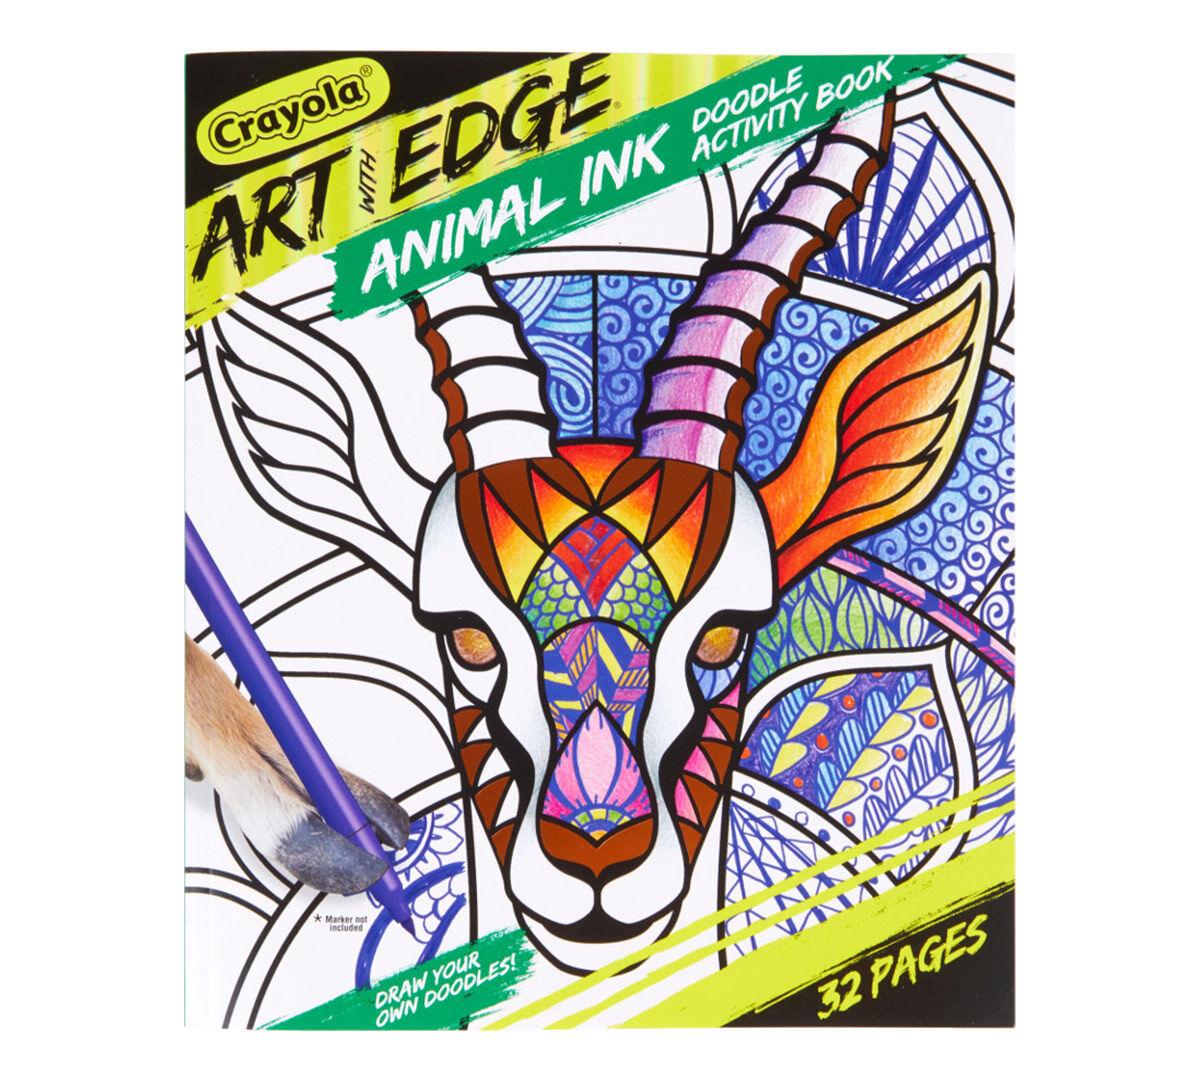 Jungle Animal Coloring Book, Adult Coloring | Crayola.com | Crayola